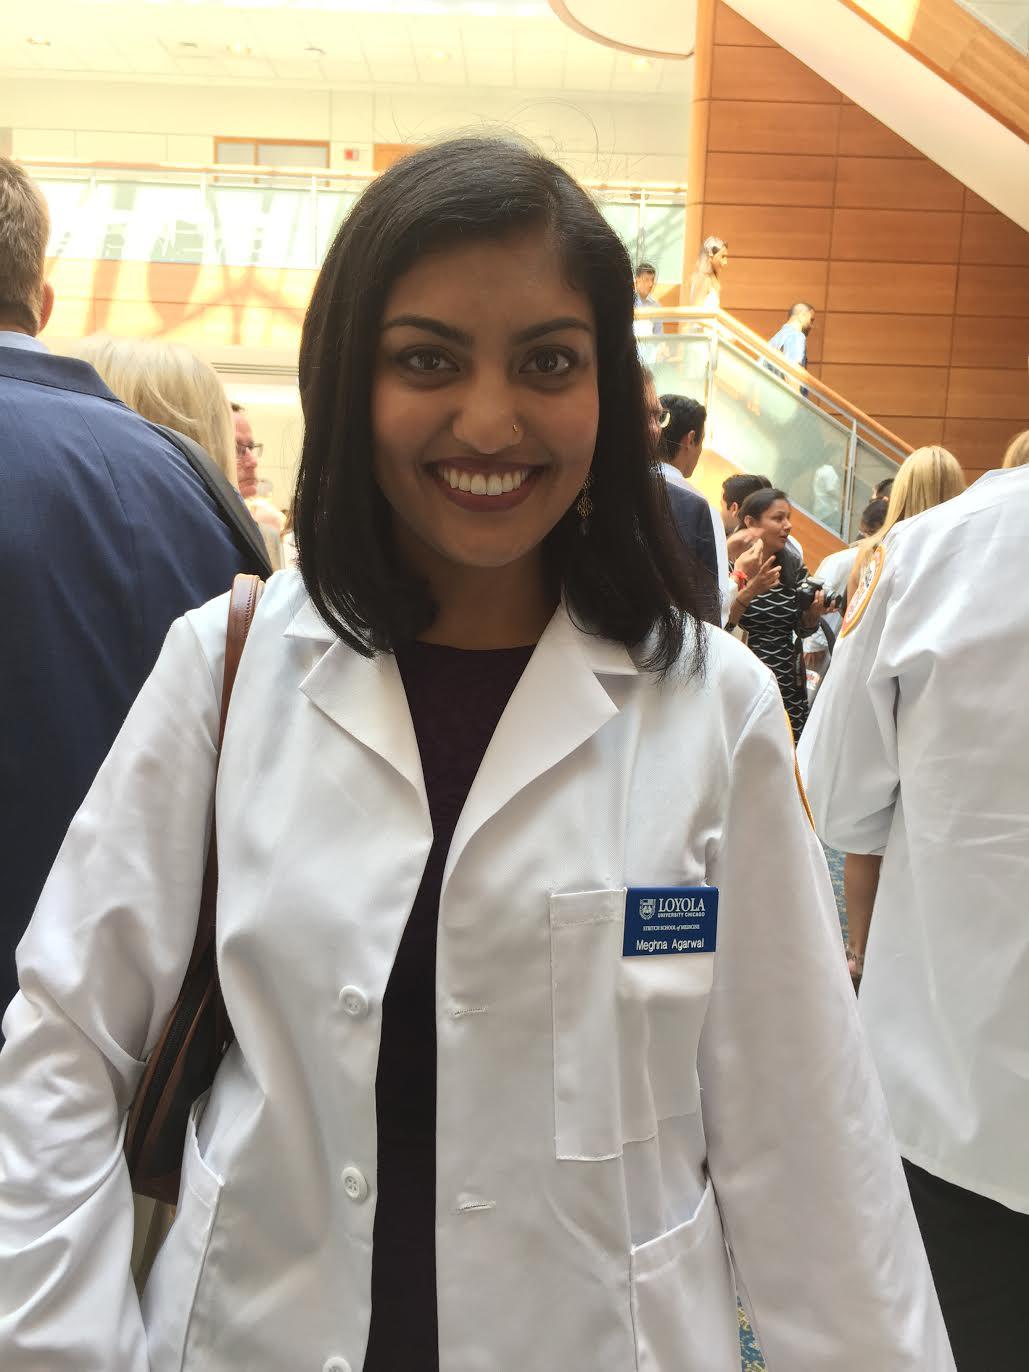 Meghna Agarwal